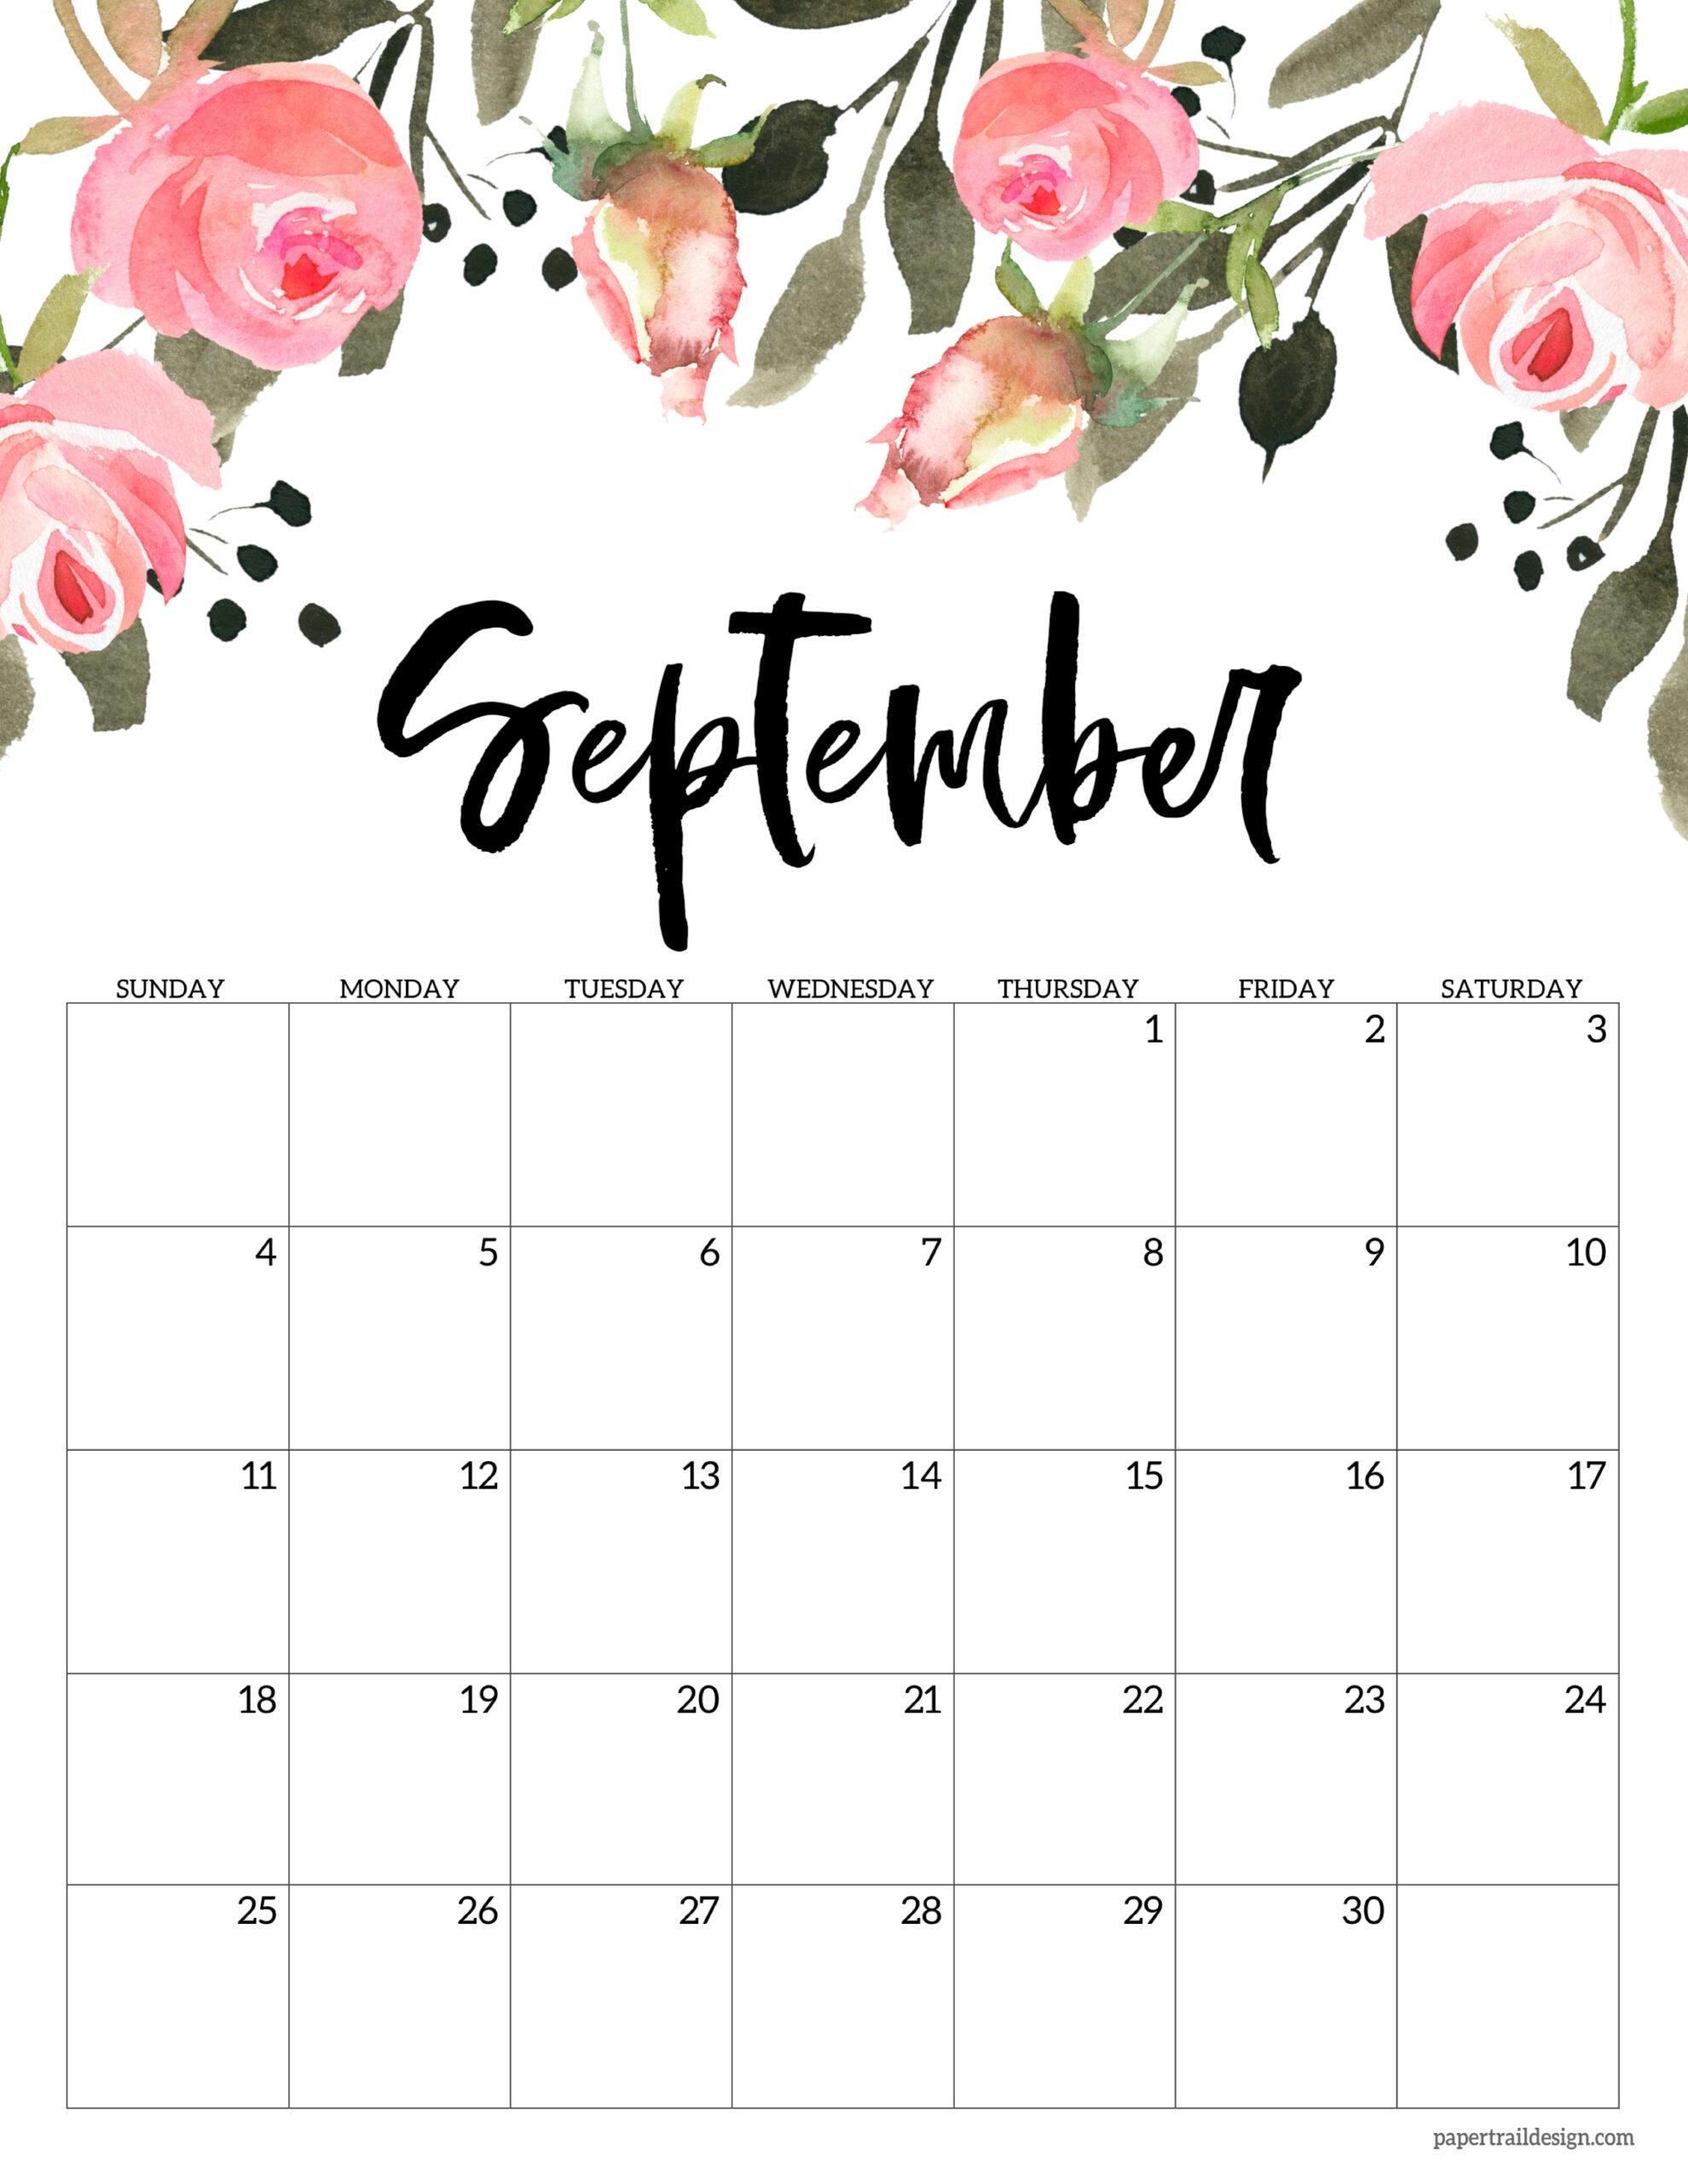 Calendar September 2022.Free 2022 Calendar Printable Floral Paper Trail Design